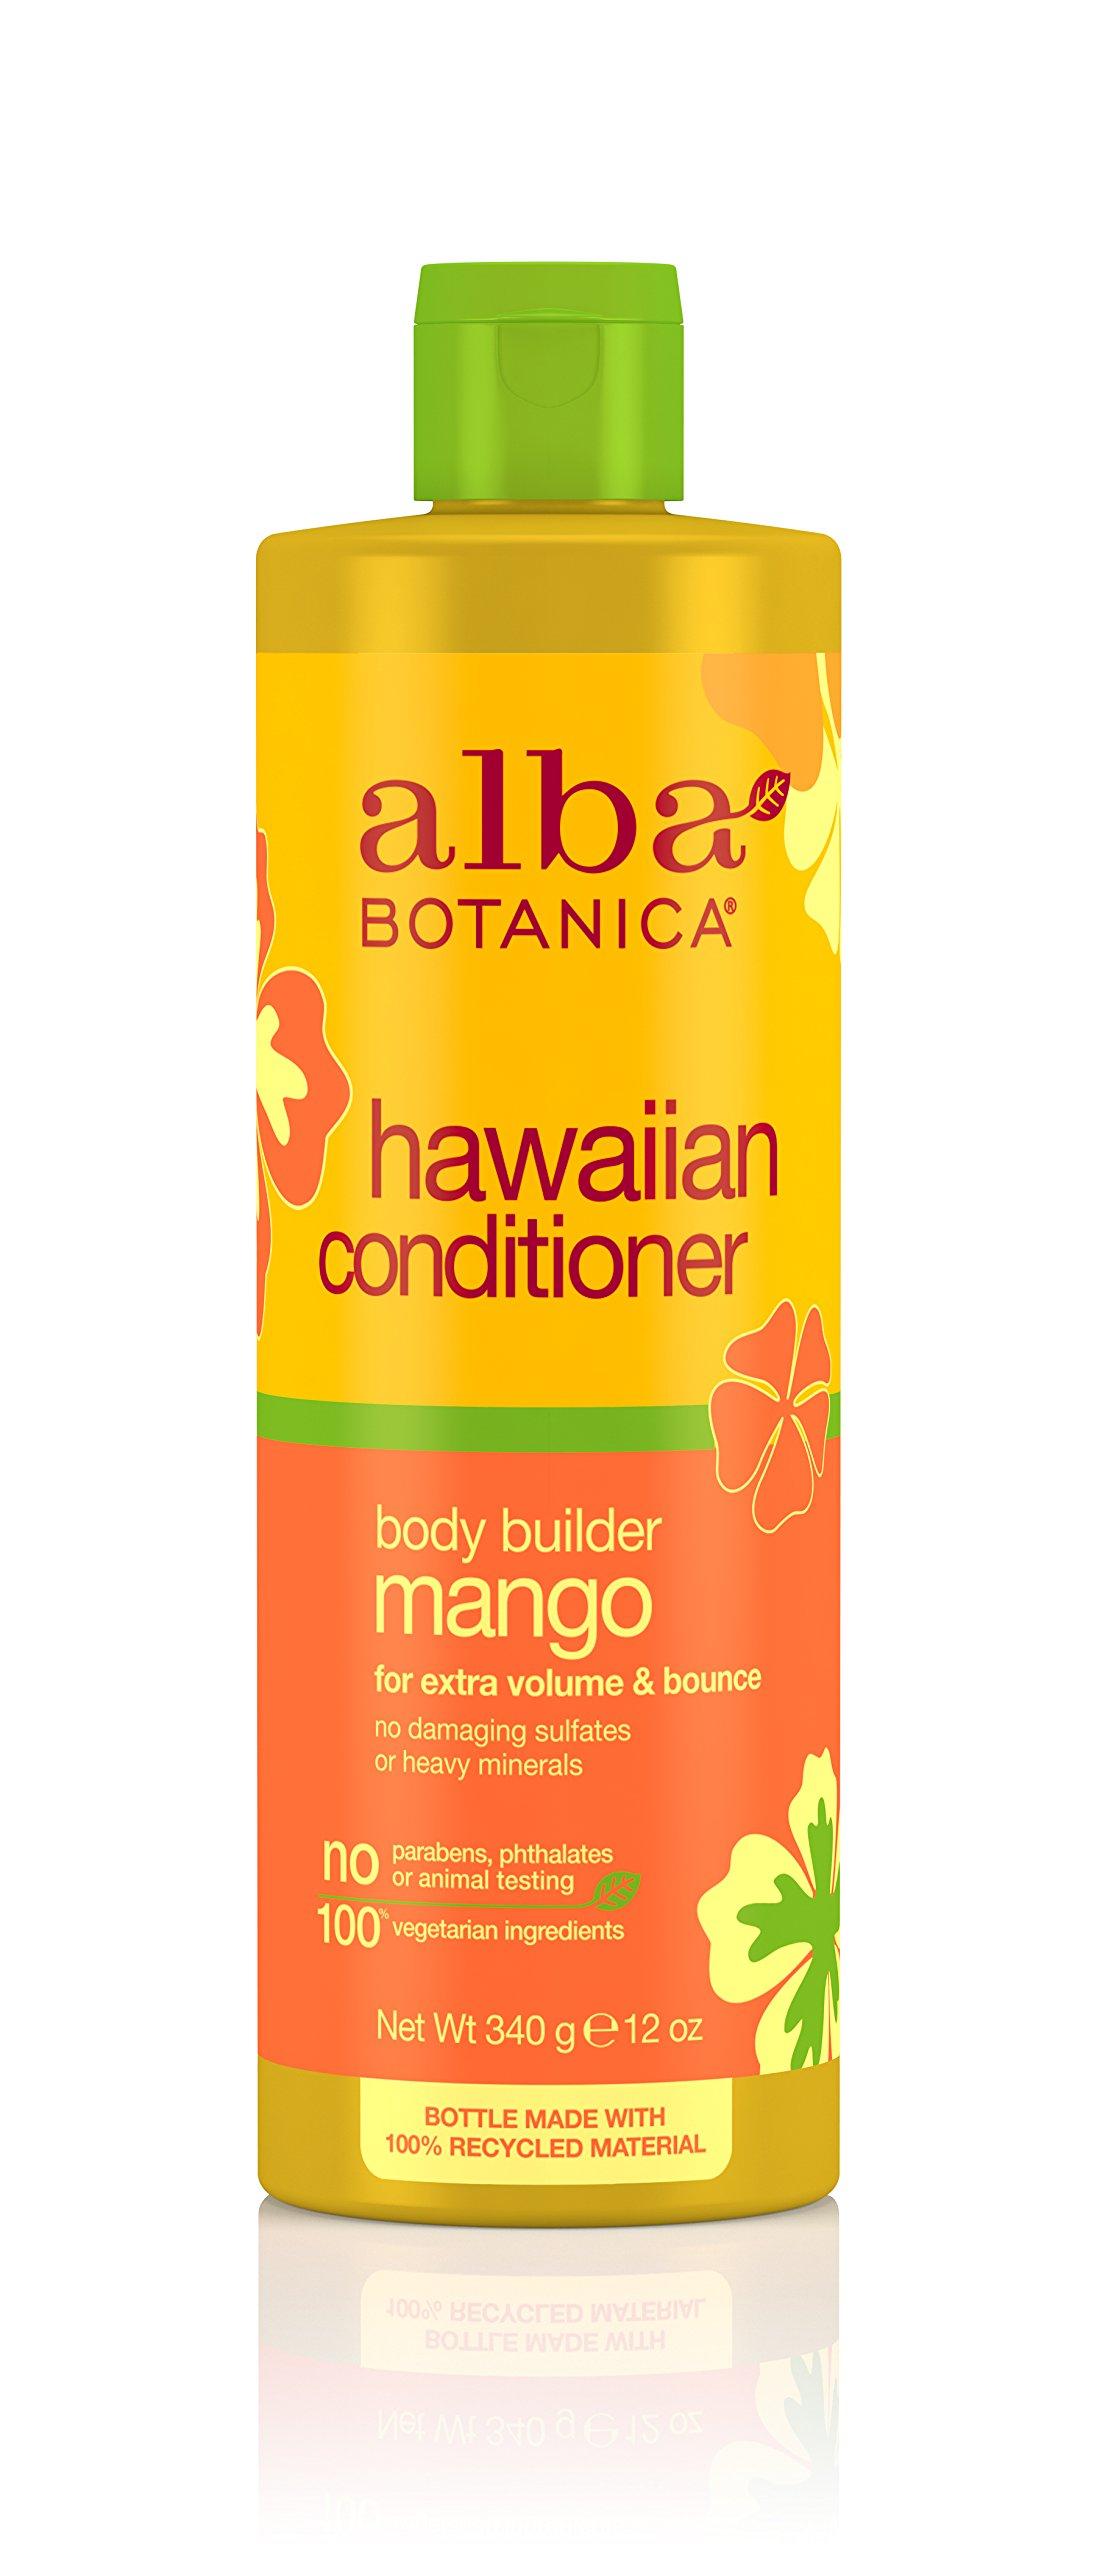 Alba Botanica Natural Hawaiian Shampoo Body Builder Mango